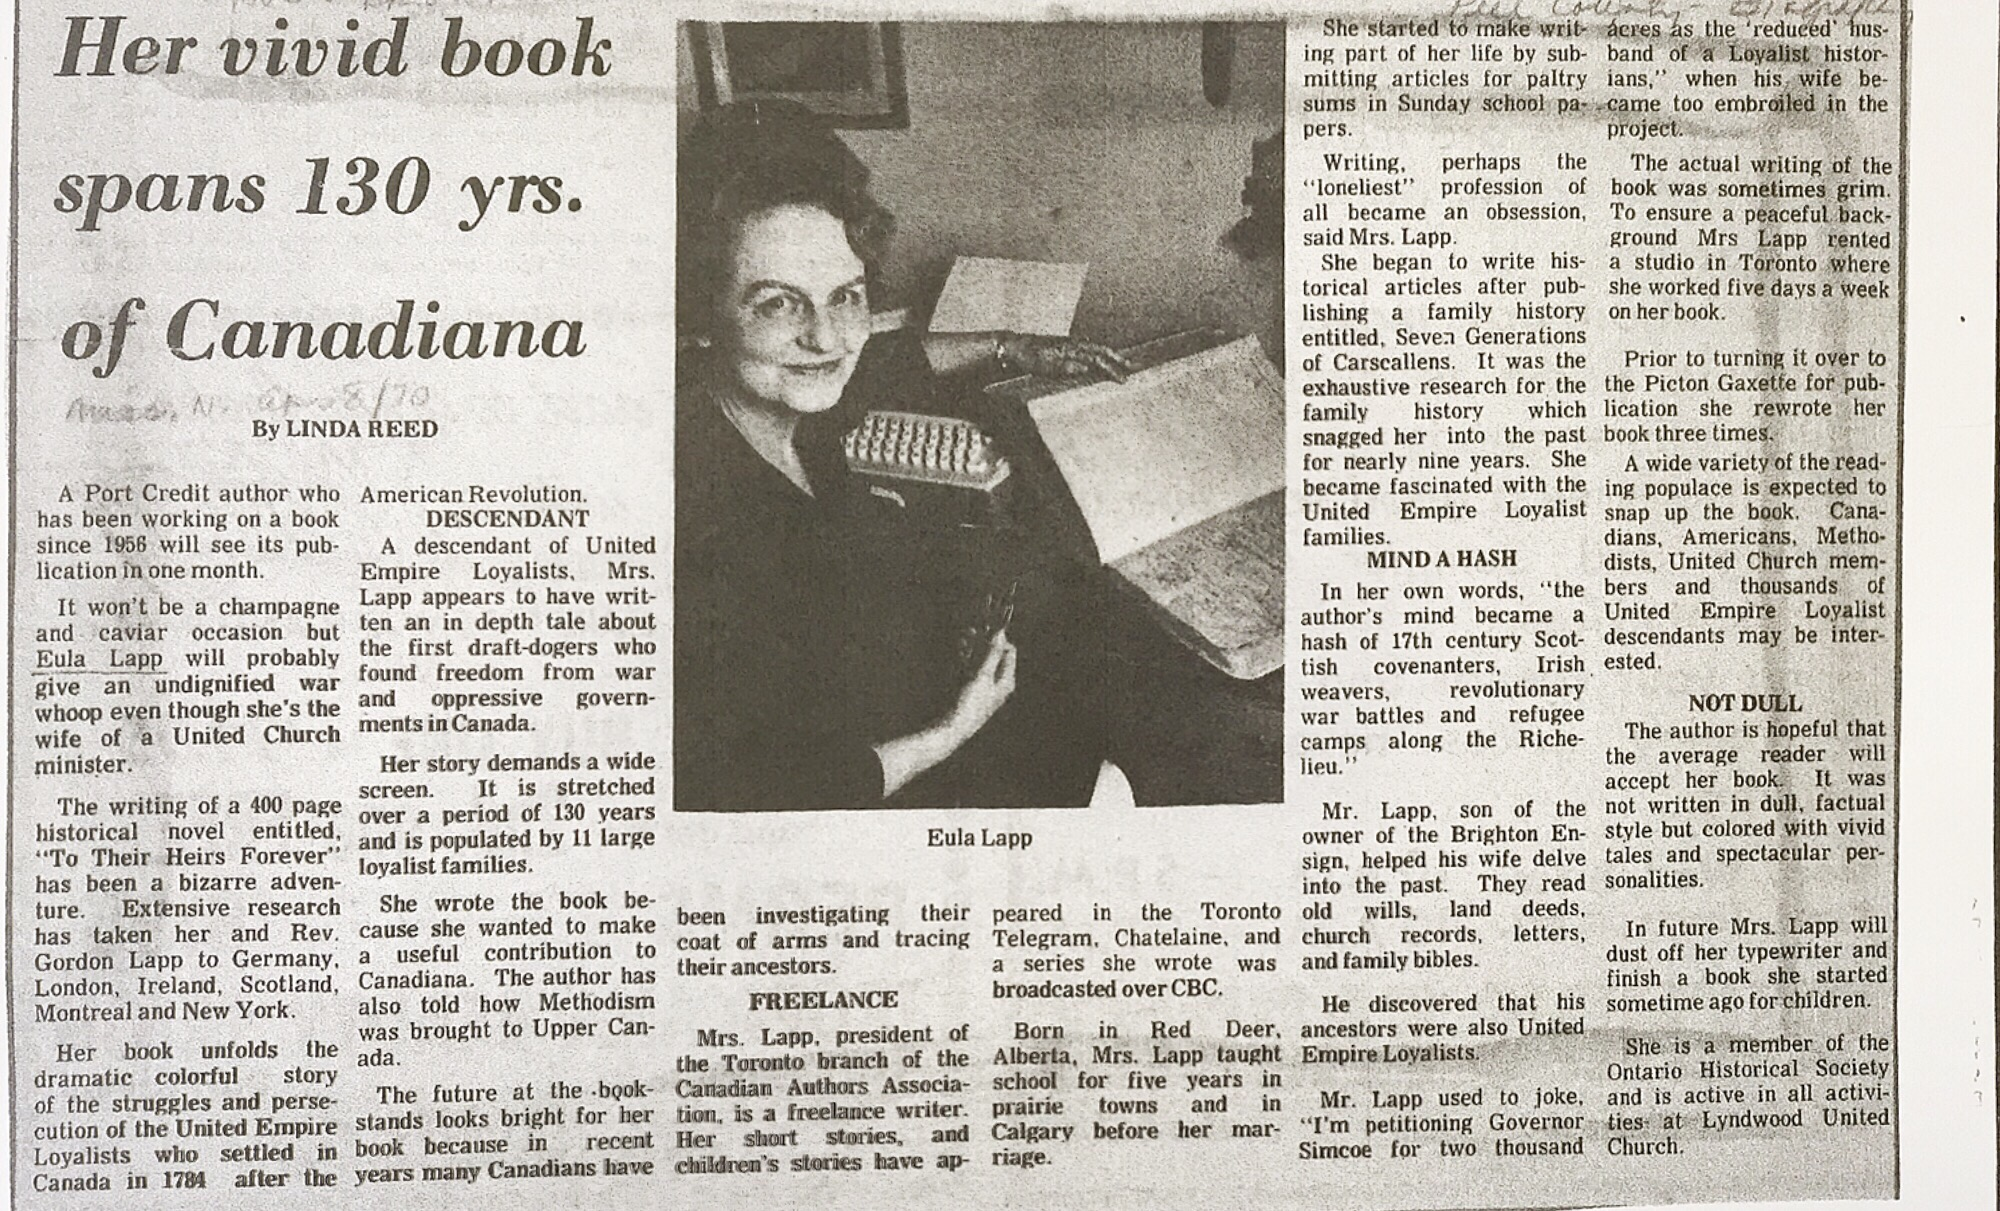 The Mississauga News - April 08 1970